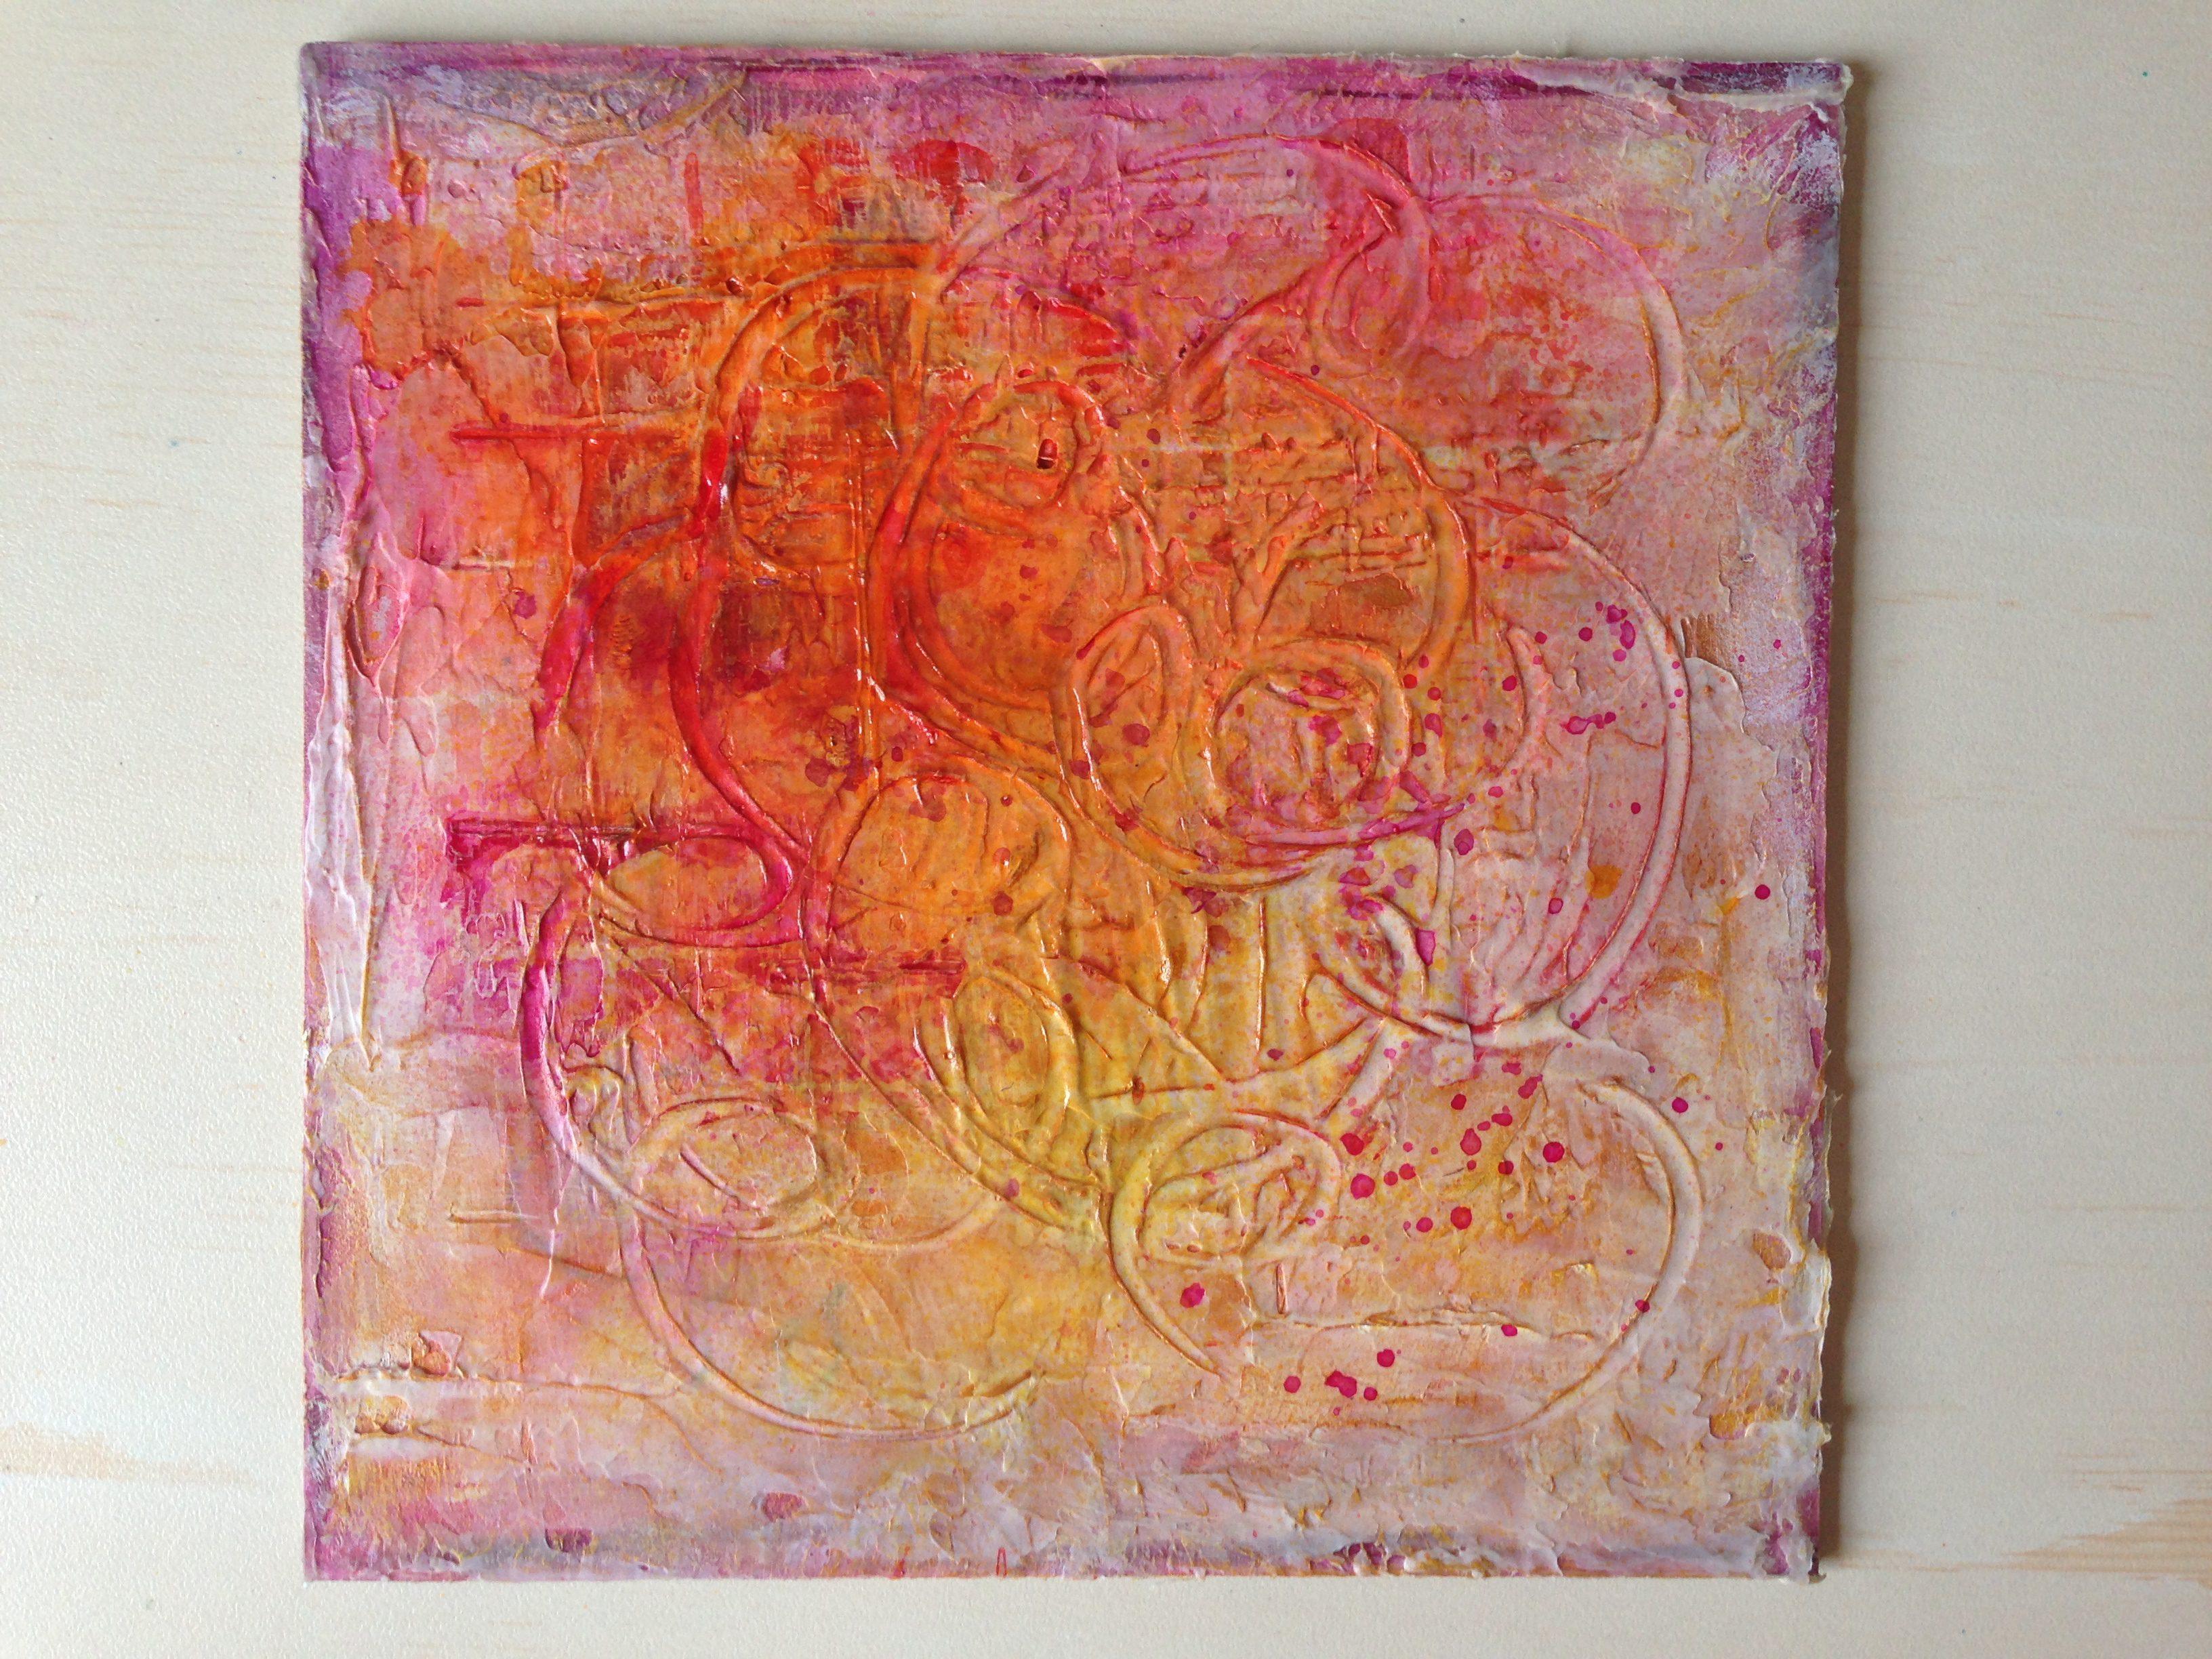 Acrylic Paintings Create art every day